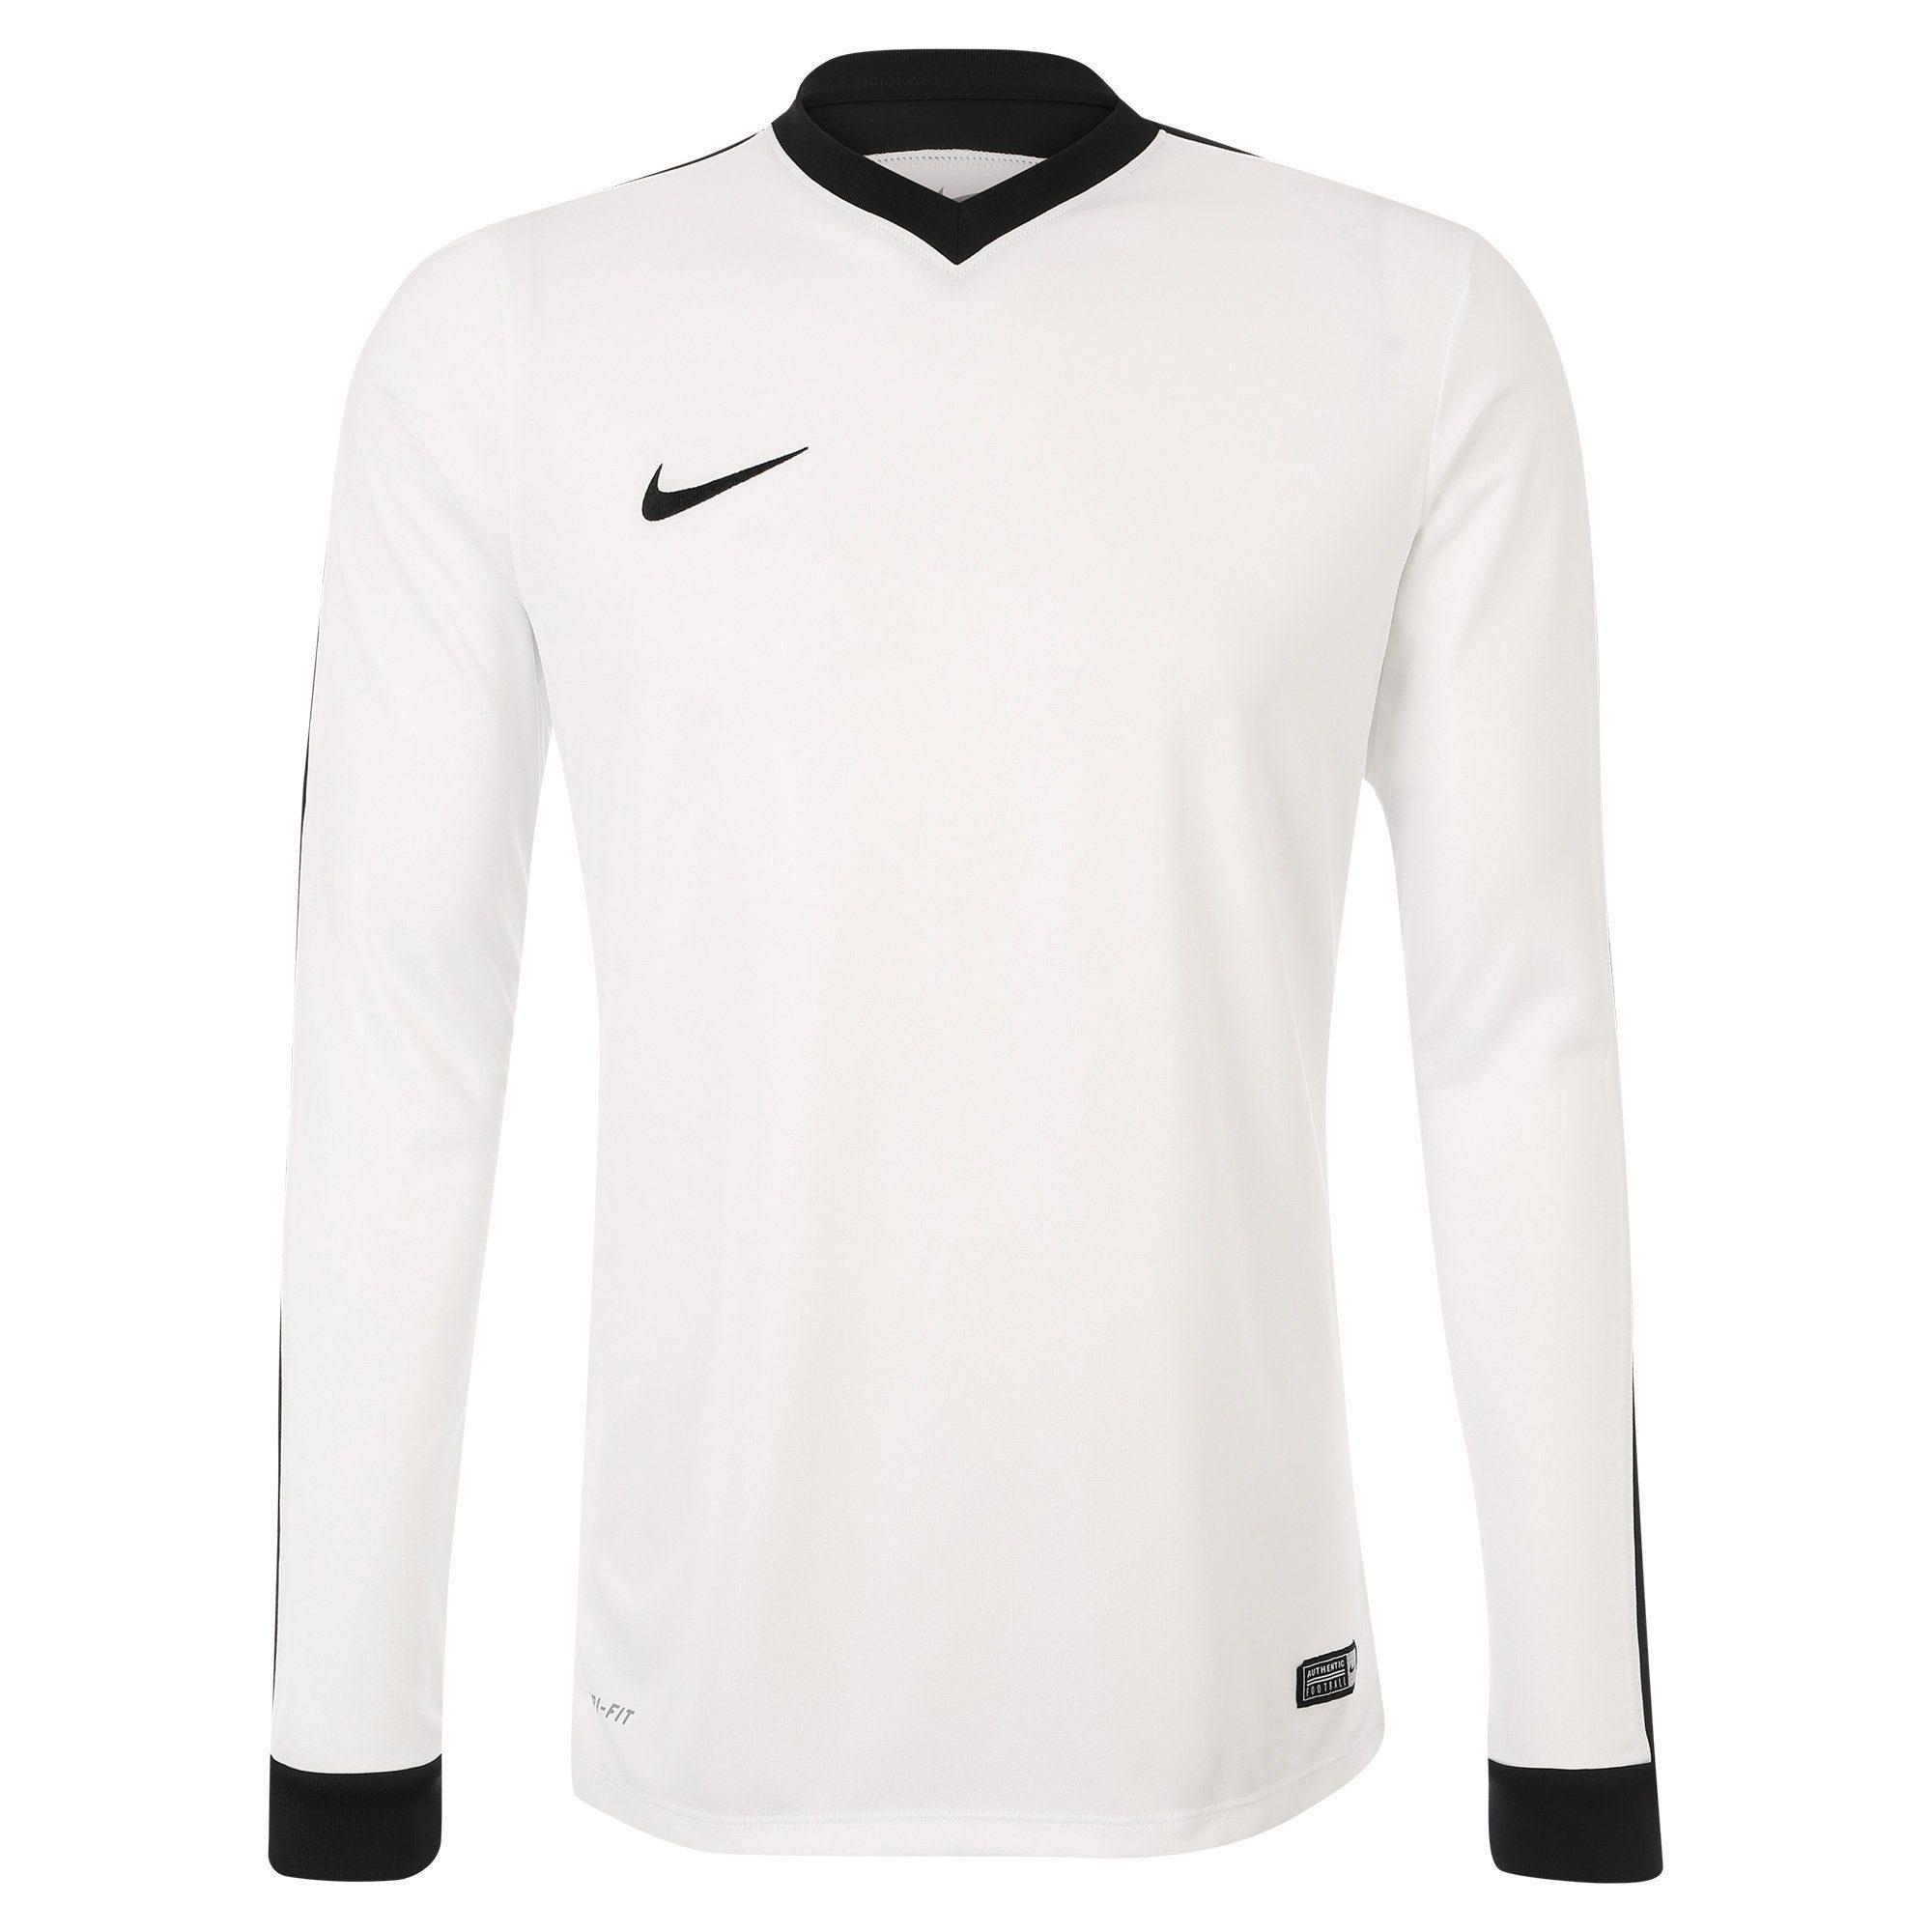 Nike Fußballtrikot Striker Iv Preisvergleich